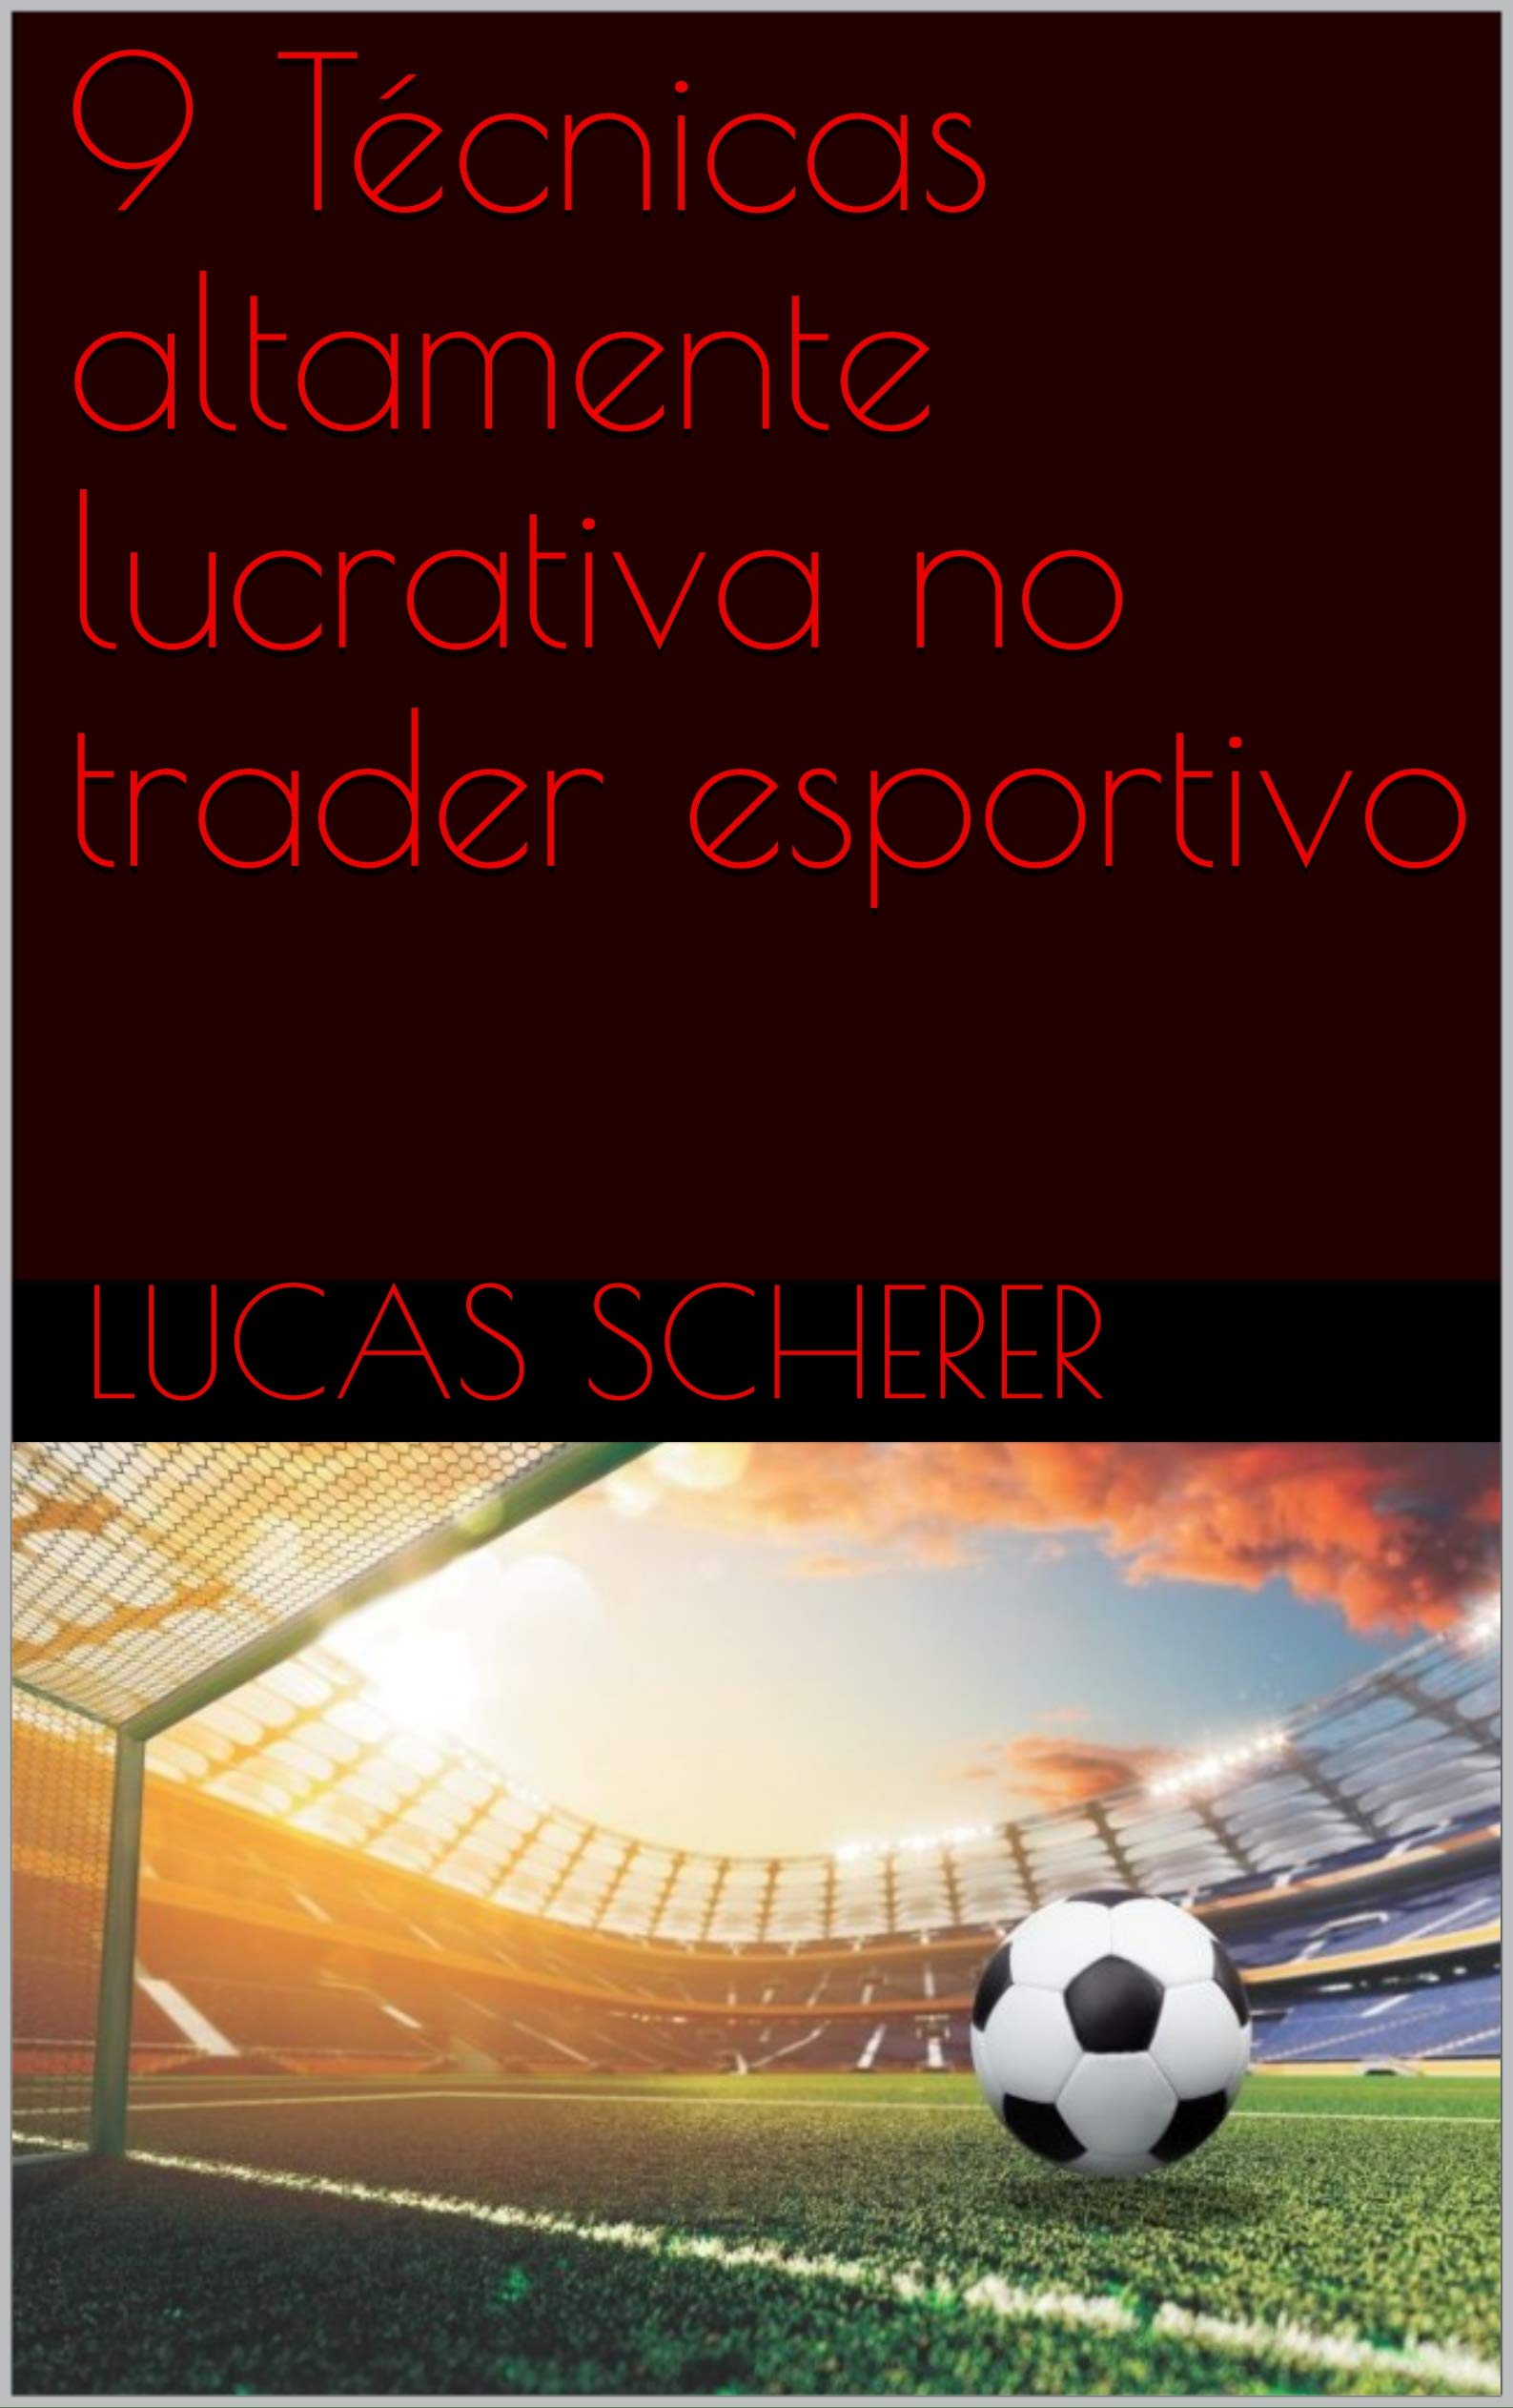 9 Técnicas altamente lucrativa no trader esportivo (Portuguese Edition)